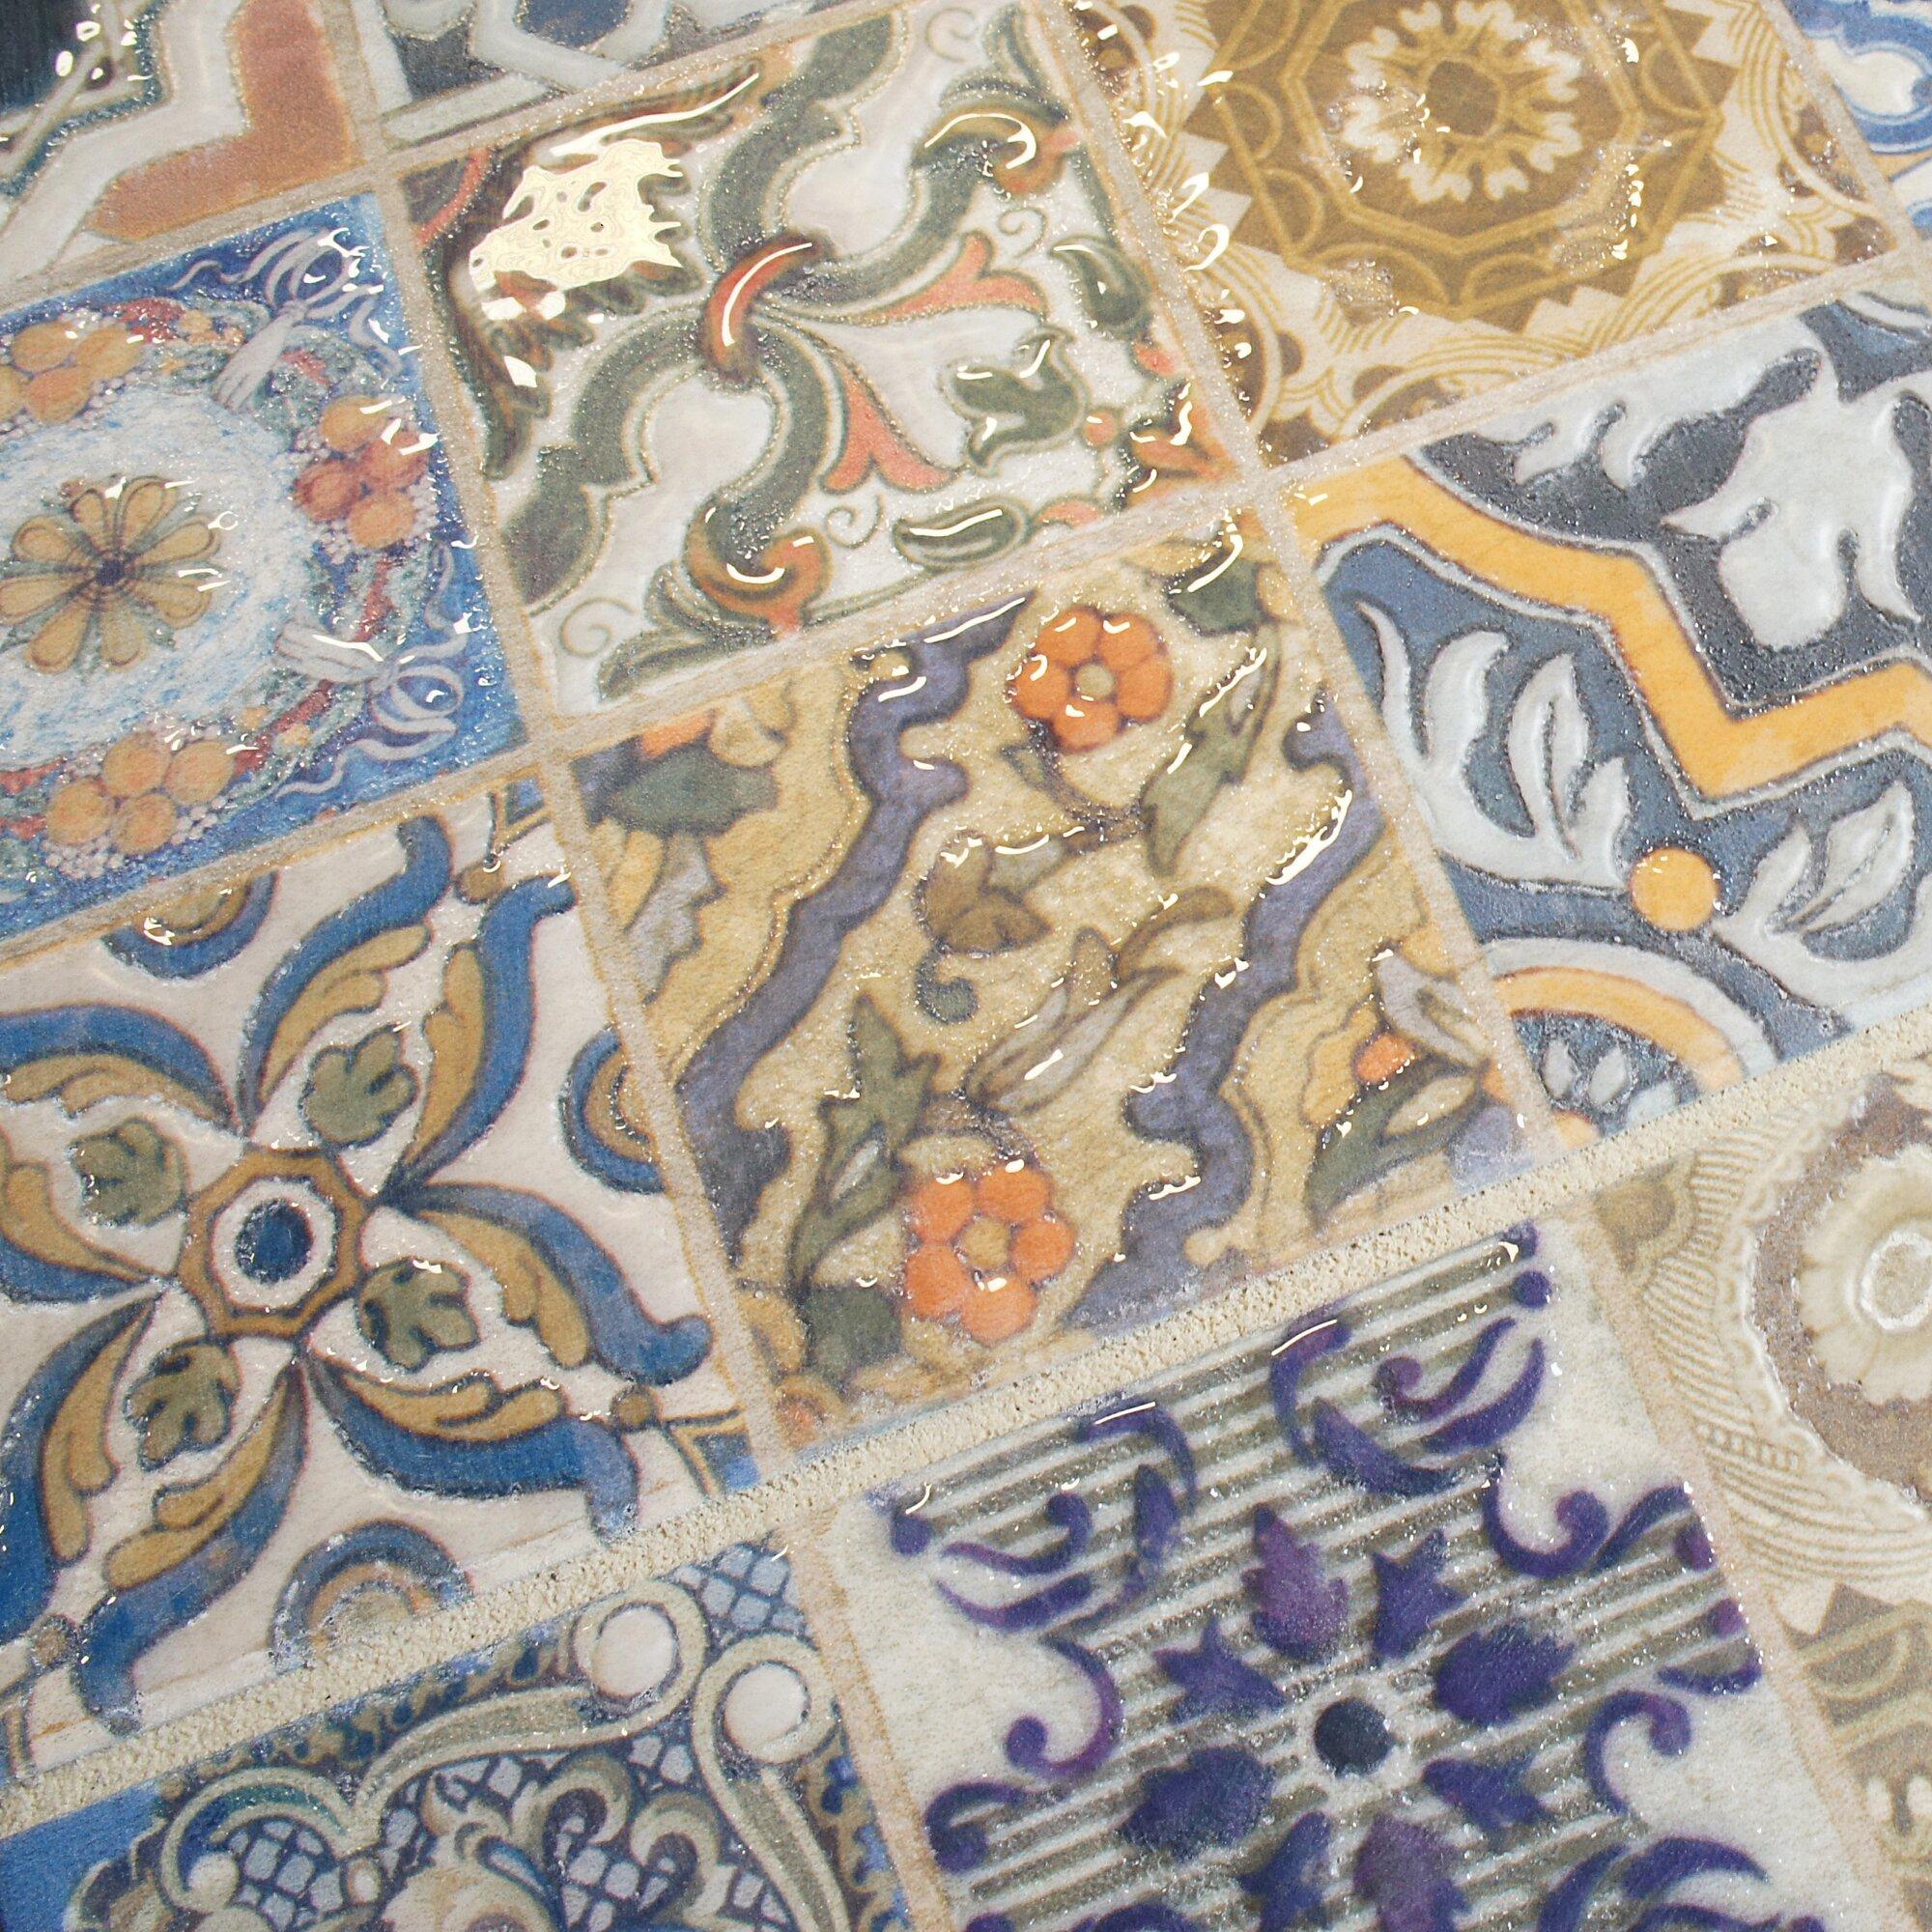 Elitetile obila 12 5 x 12 5 ceramic field tile in blue for 12 x 12 blue ceramic floor tile